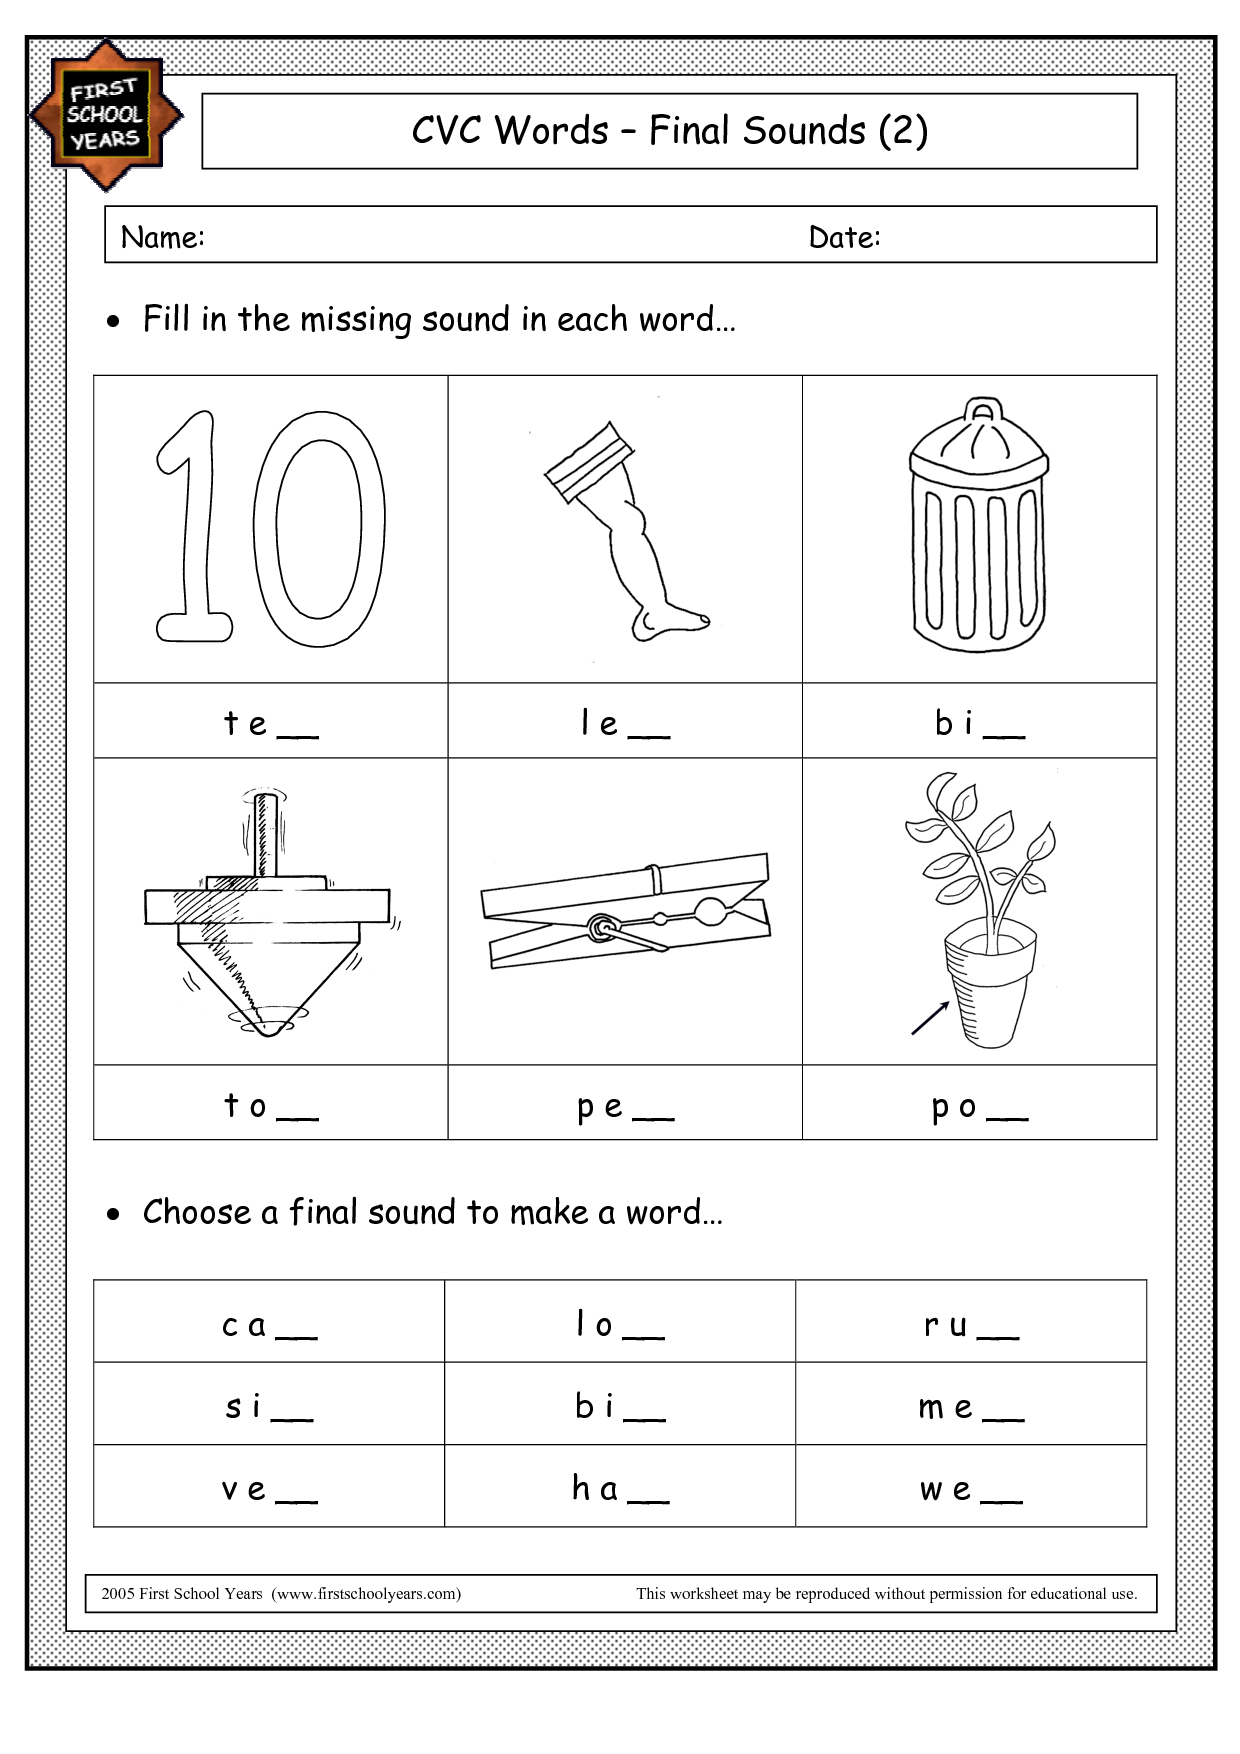 medium resolution of ending sound worksheet   Cvc words